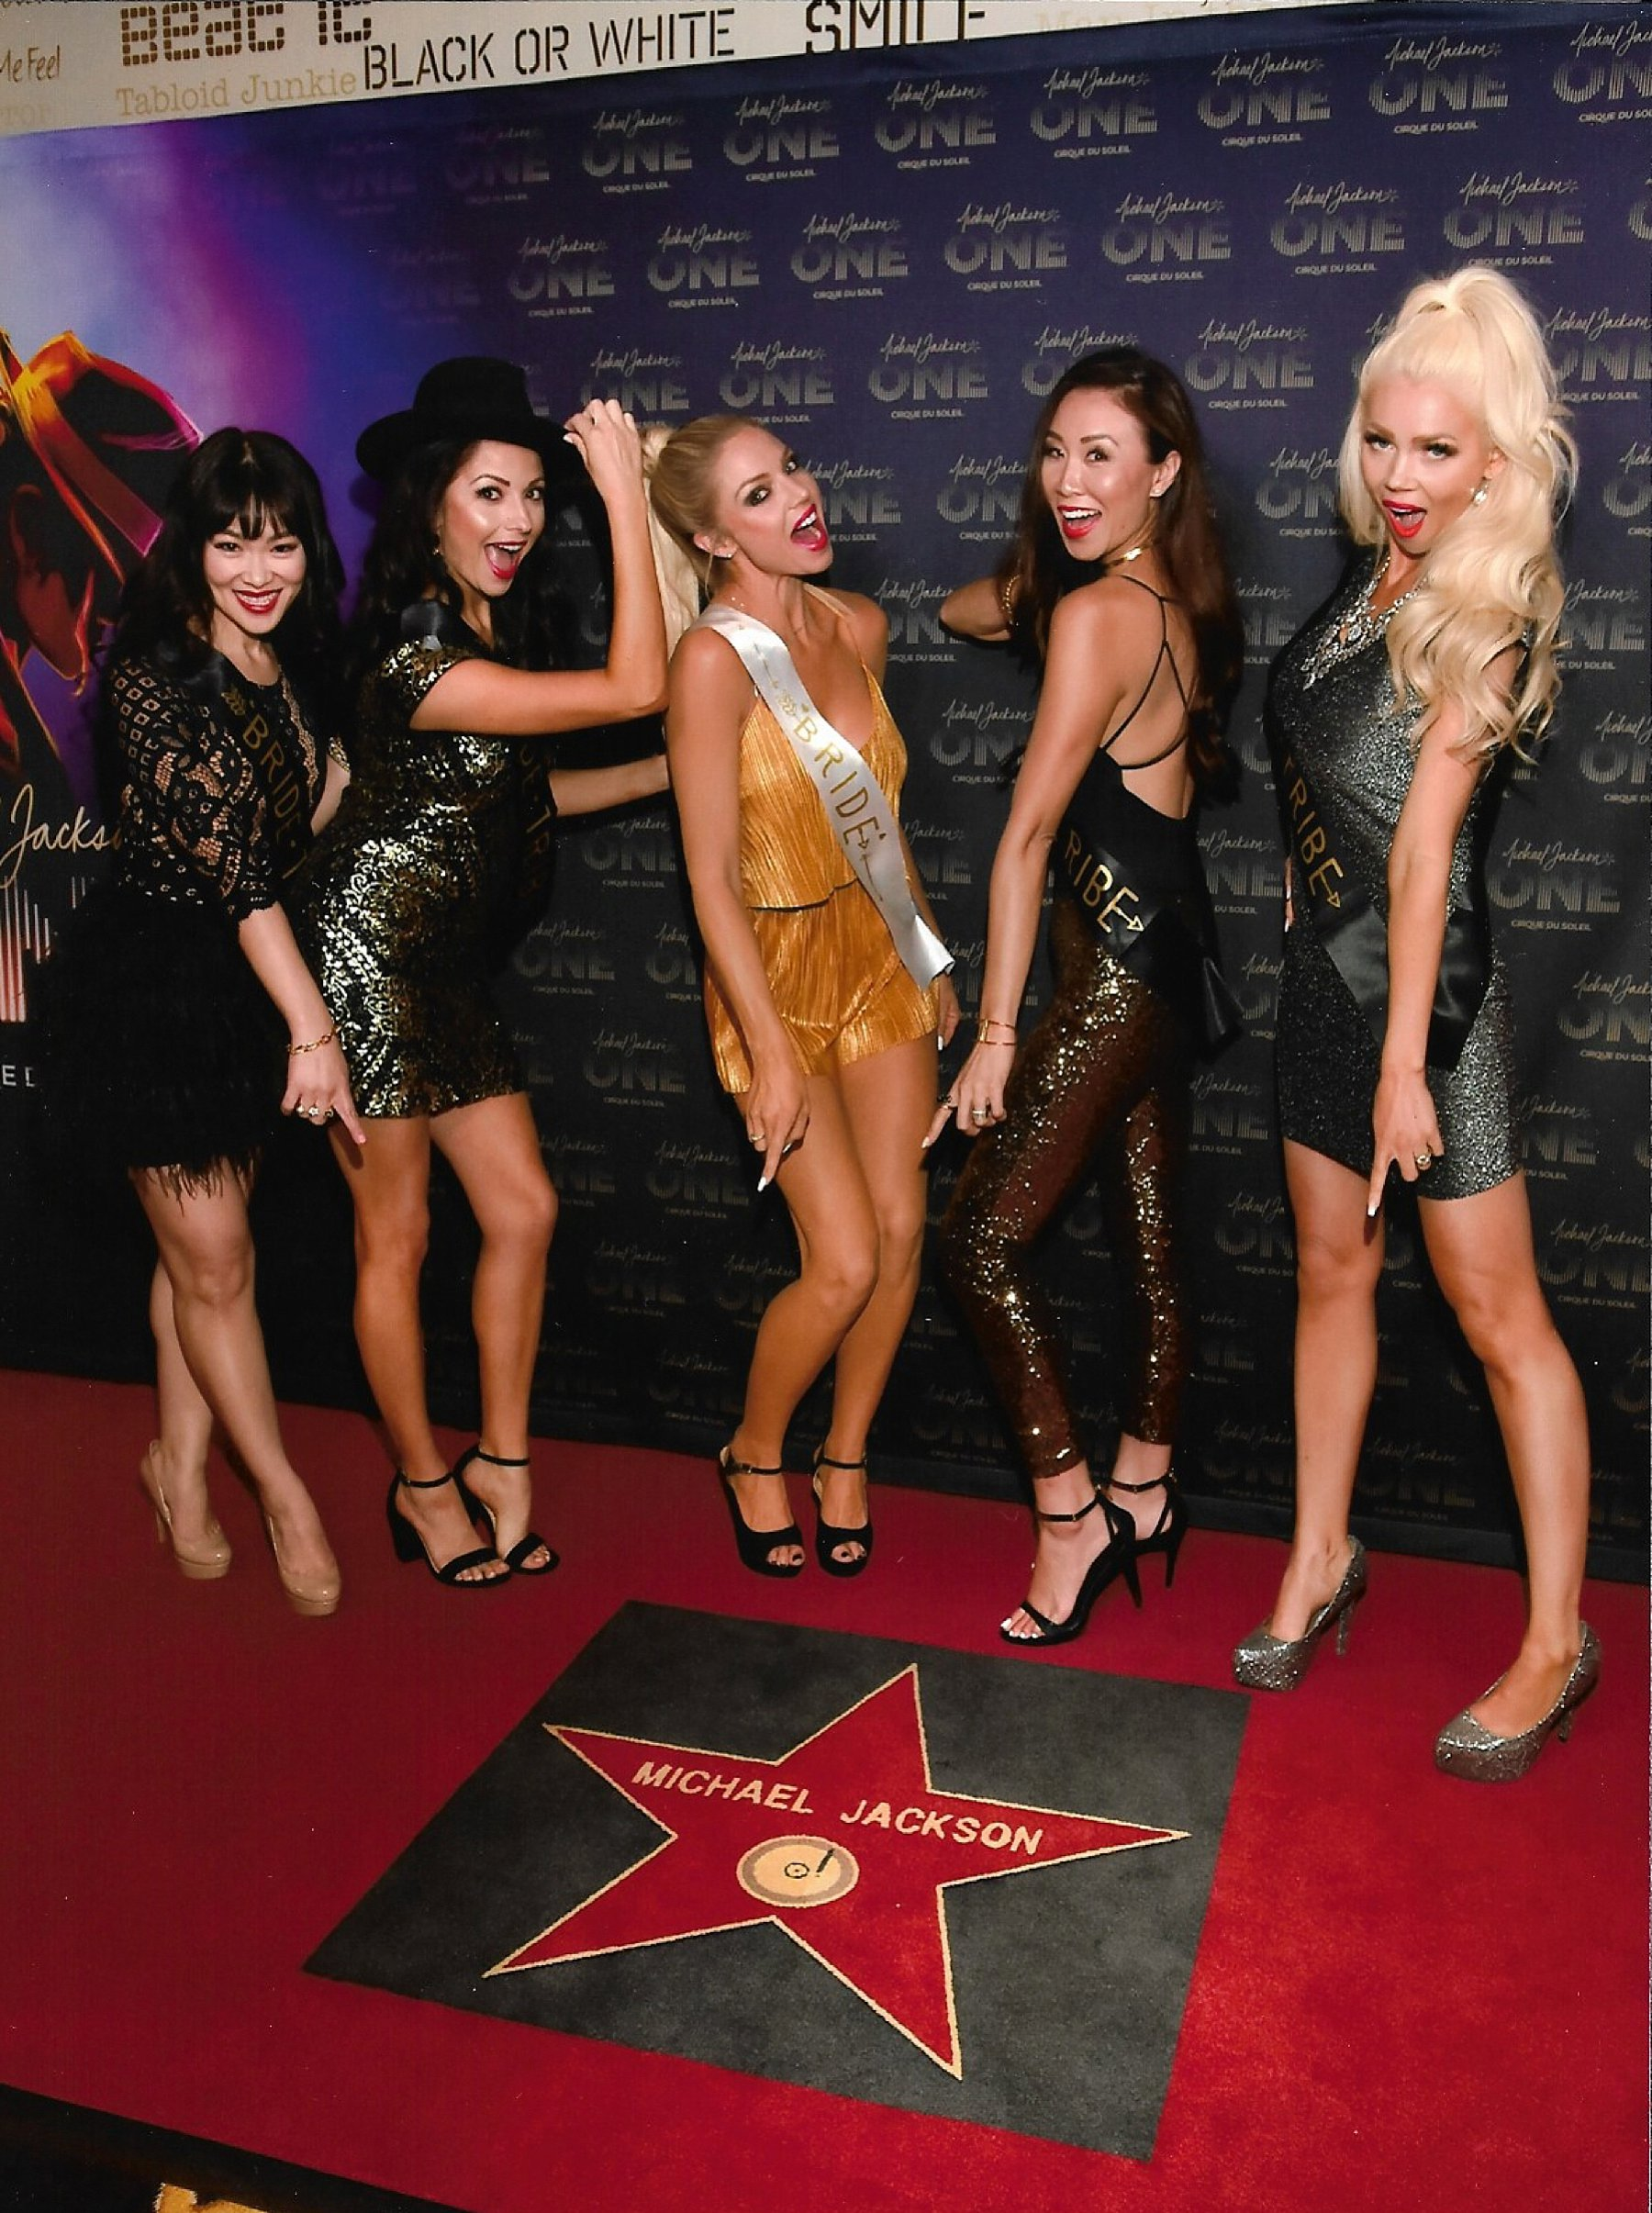 Vegas girl's trip fun things to do - Michael Jackson ONE cirque du soliel show